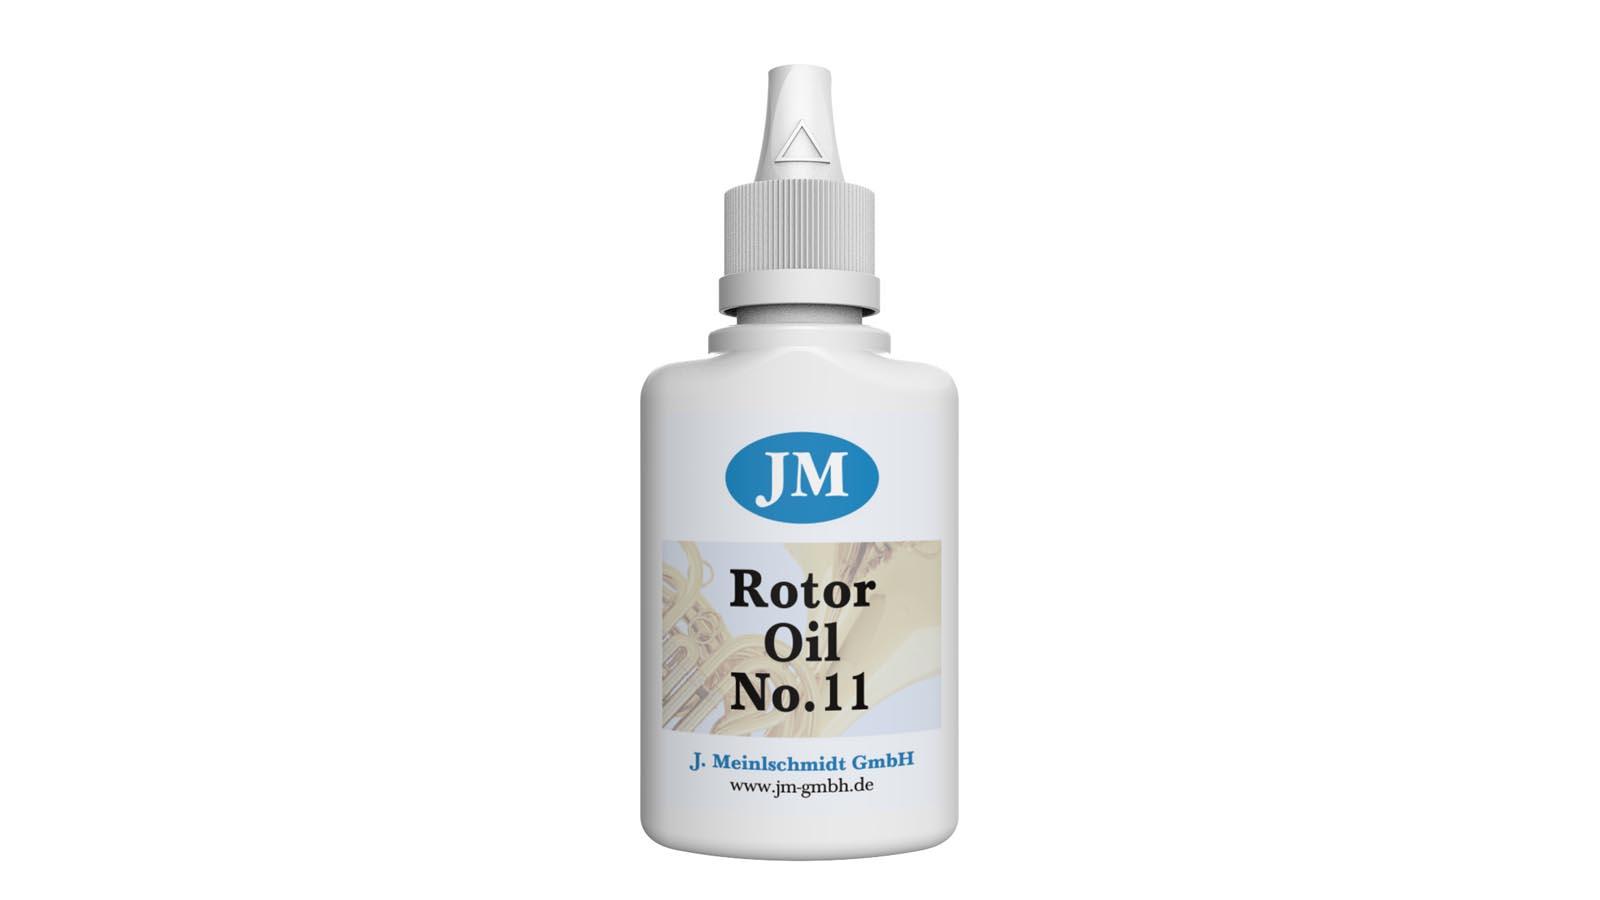 J.Meinlschmidt GmbH Nr.11 Drehventil Trompete Rotor Oil